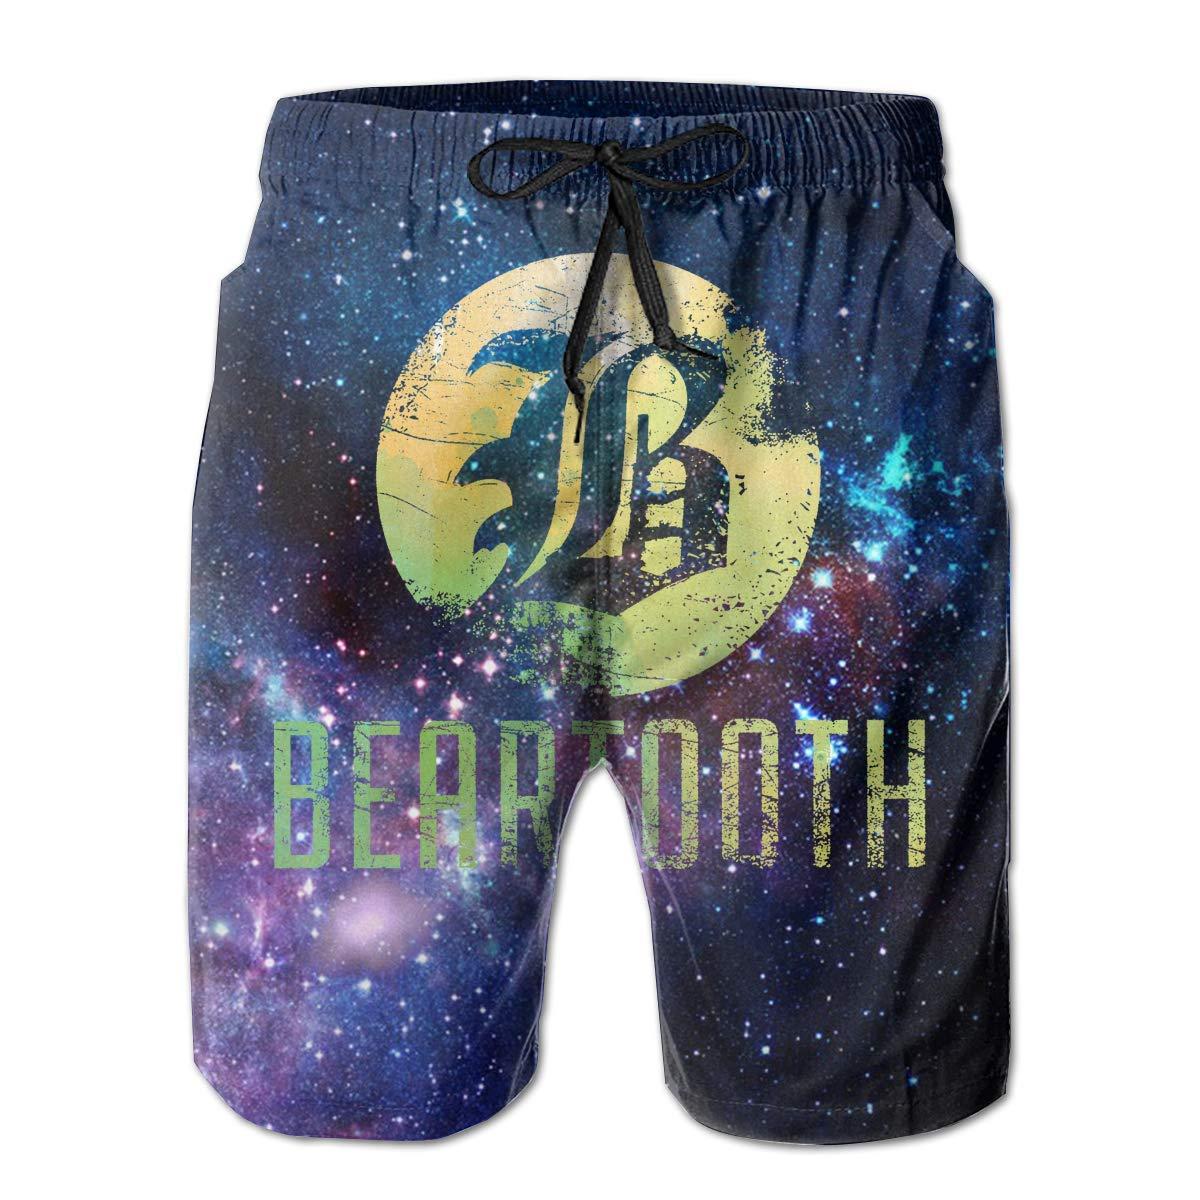 DDYJ Men Beartooth Music Band Fashion Beach Board Shorts Breathable Drawstring Boardshort